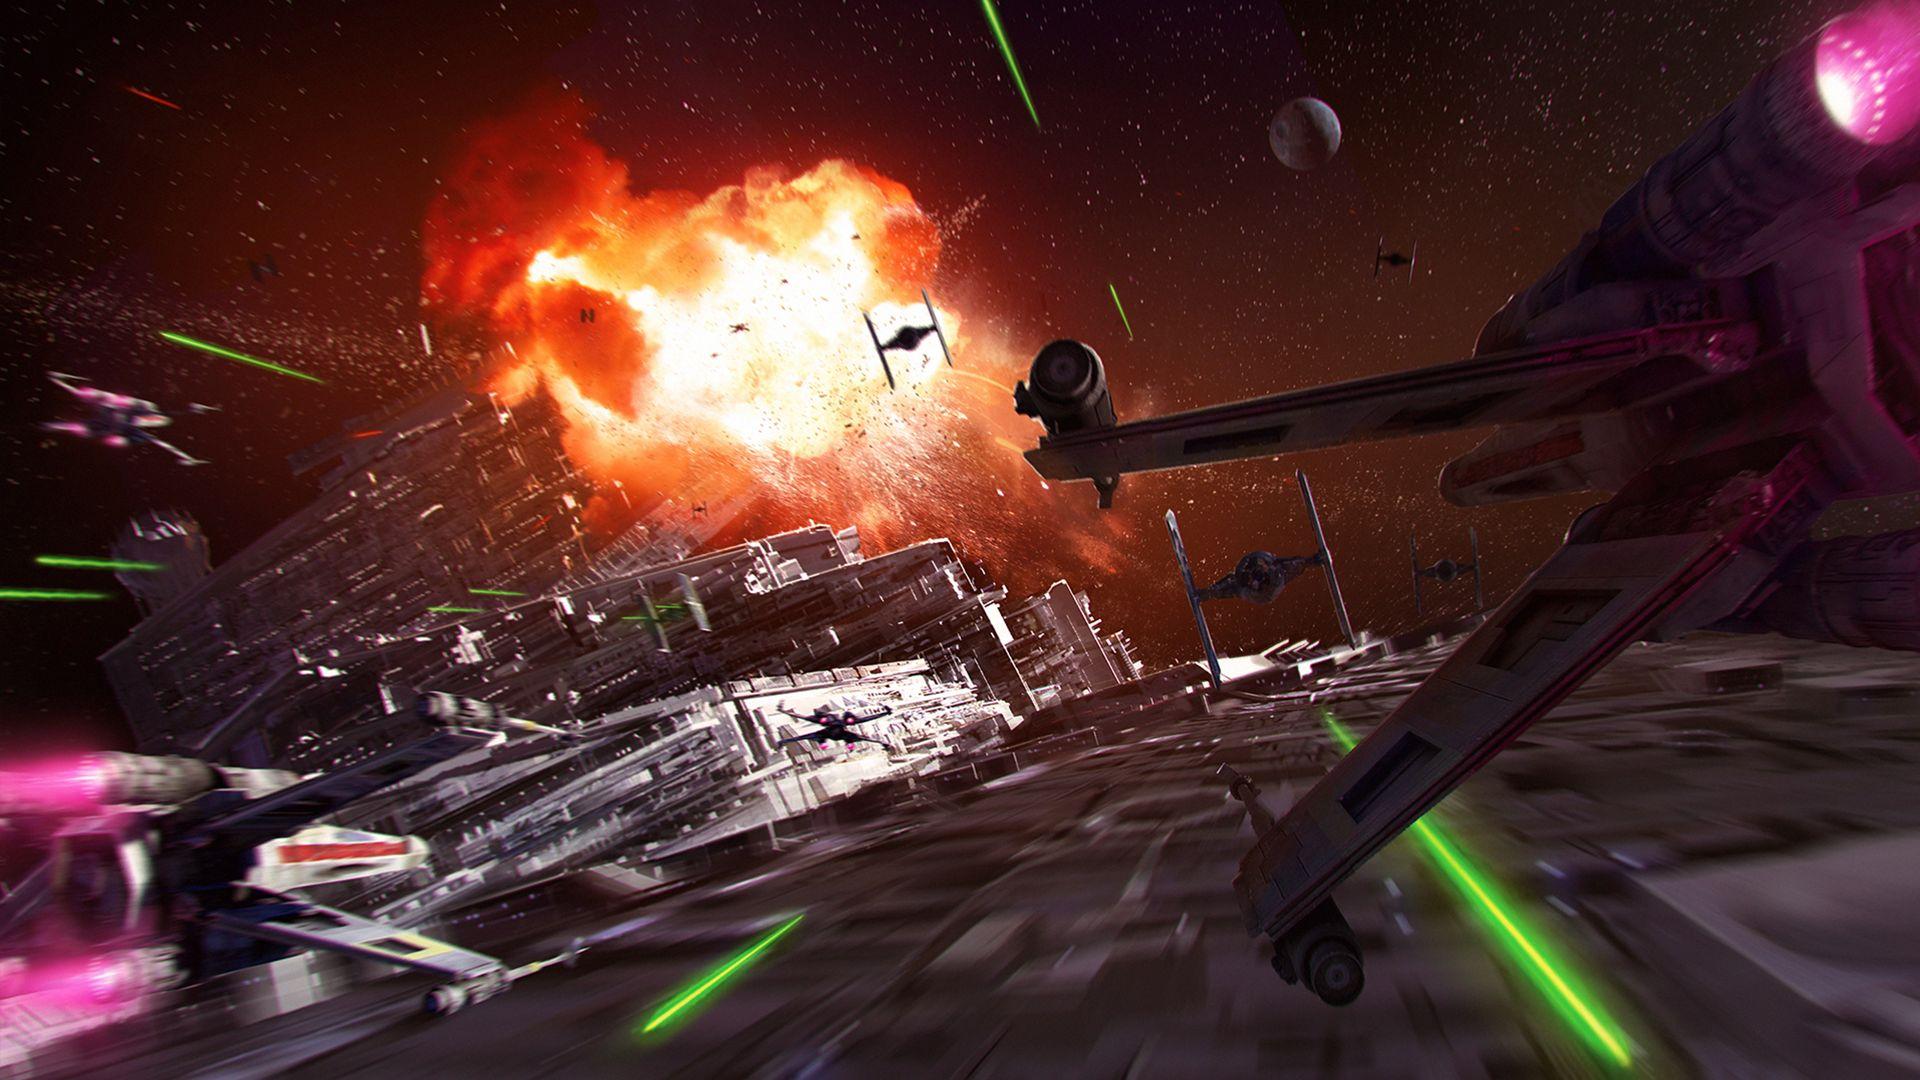 STAR WARS Battlefront Season Pass is FREE on Origin